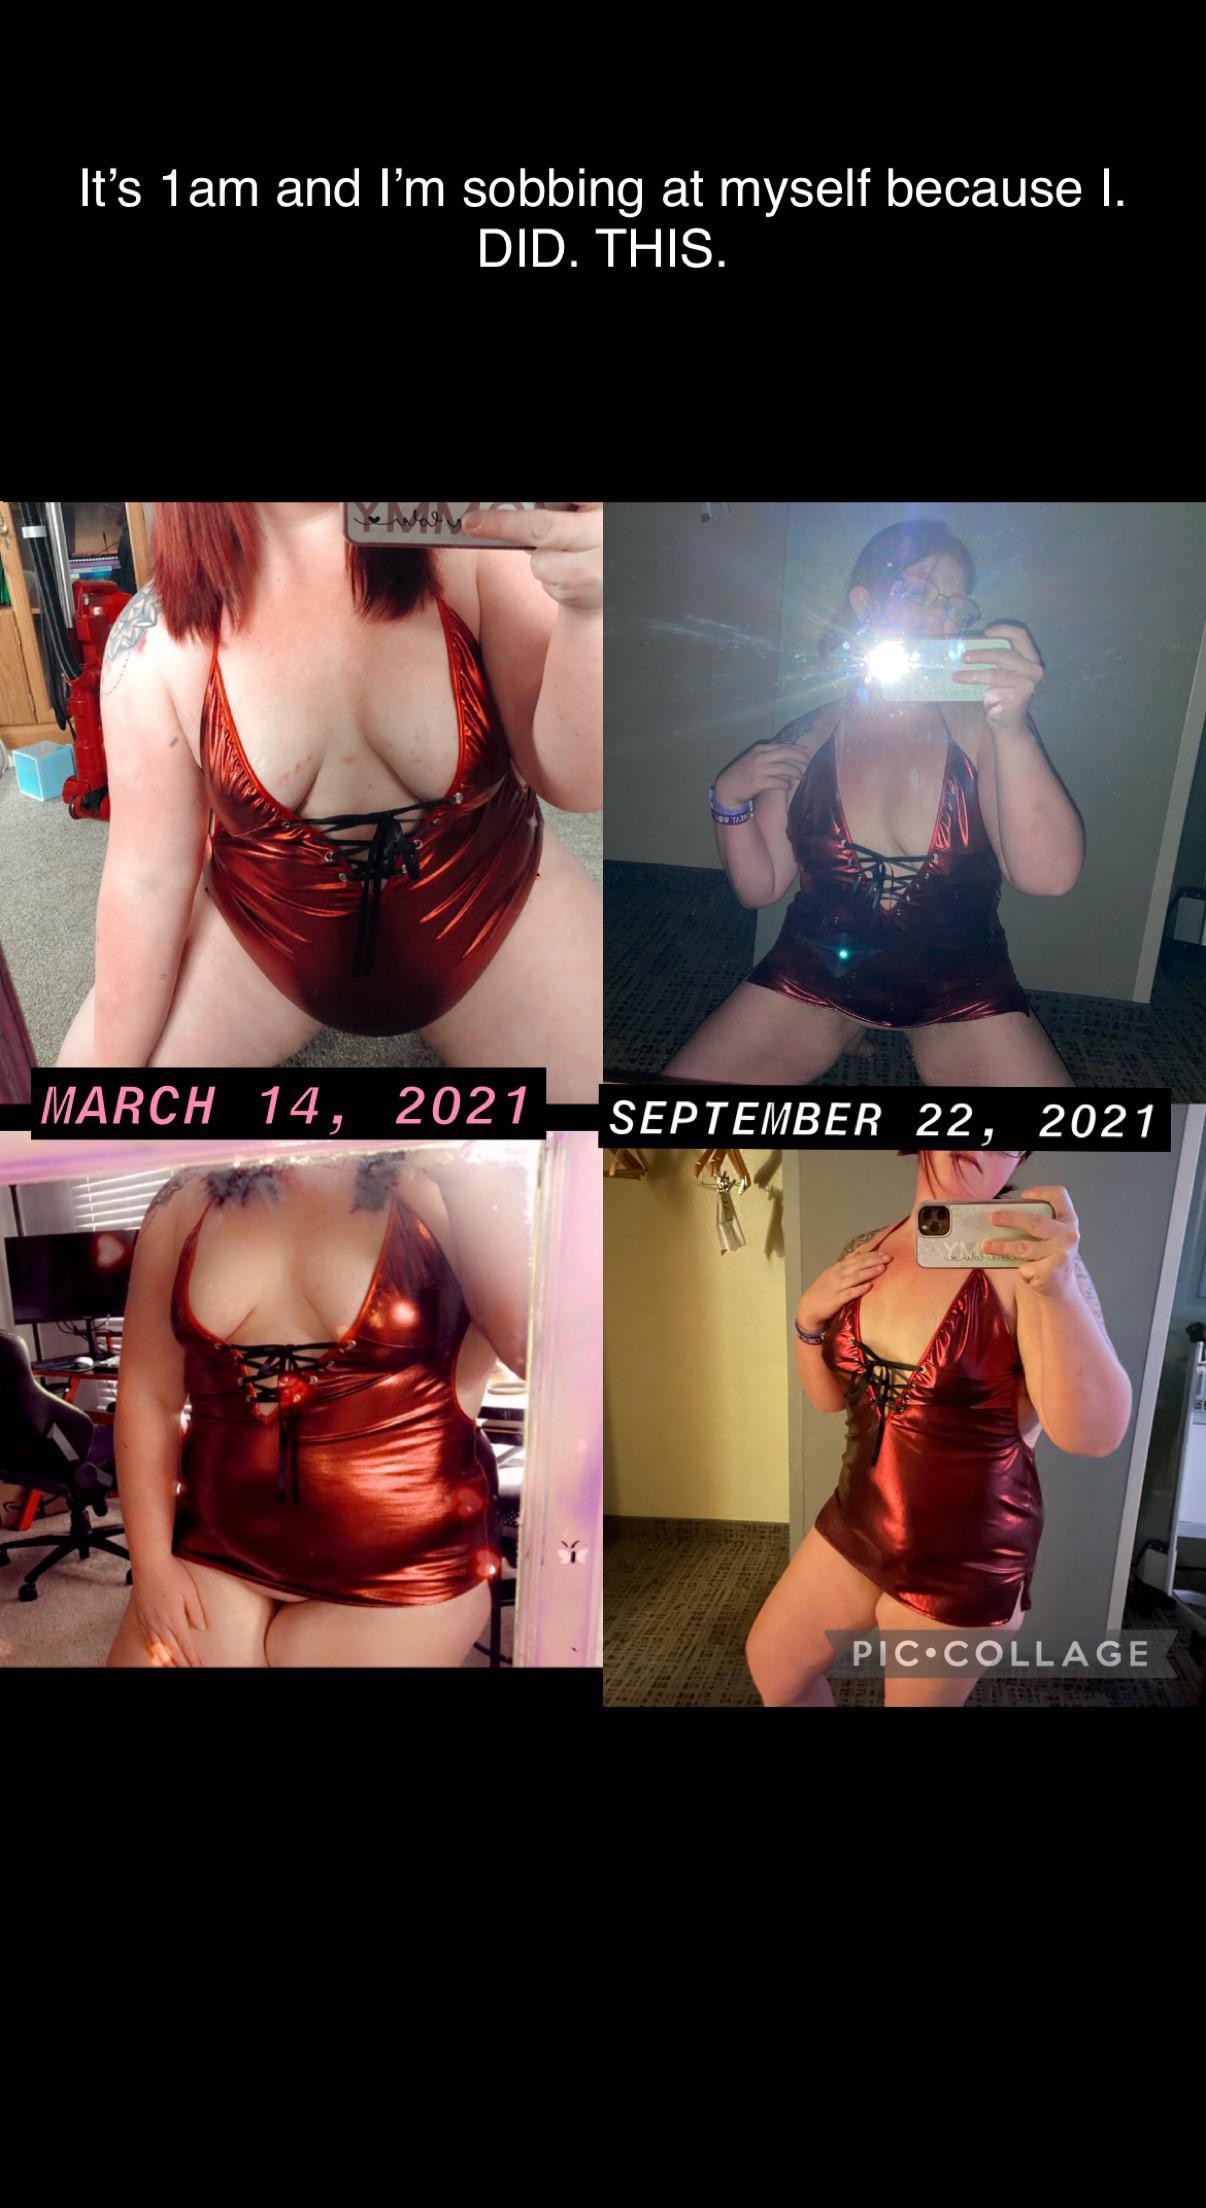 5 foot 2 Female 69 lbs Fat Loss 244 lbs to 175 lbs